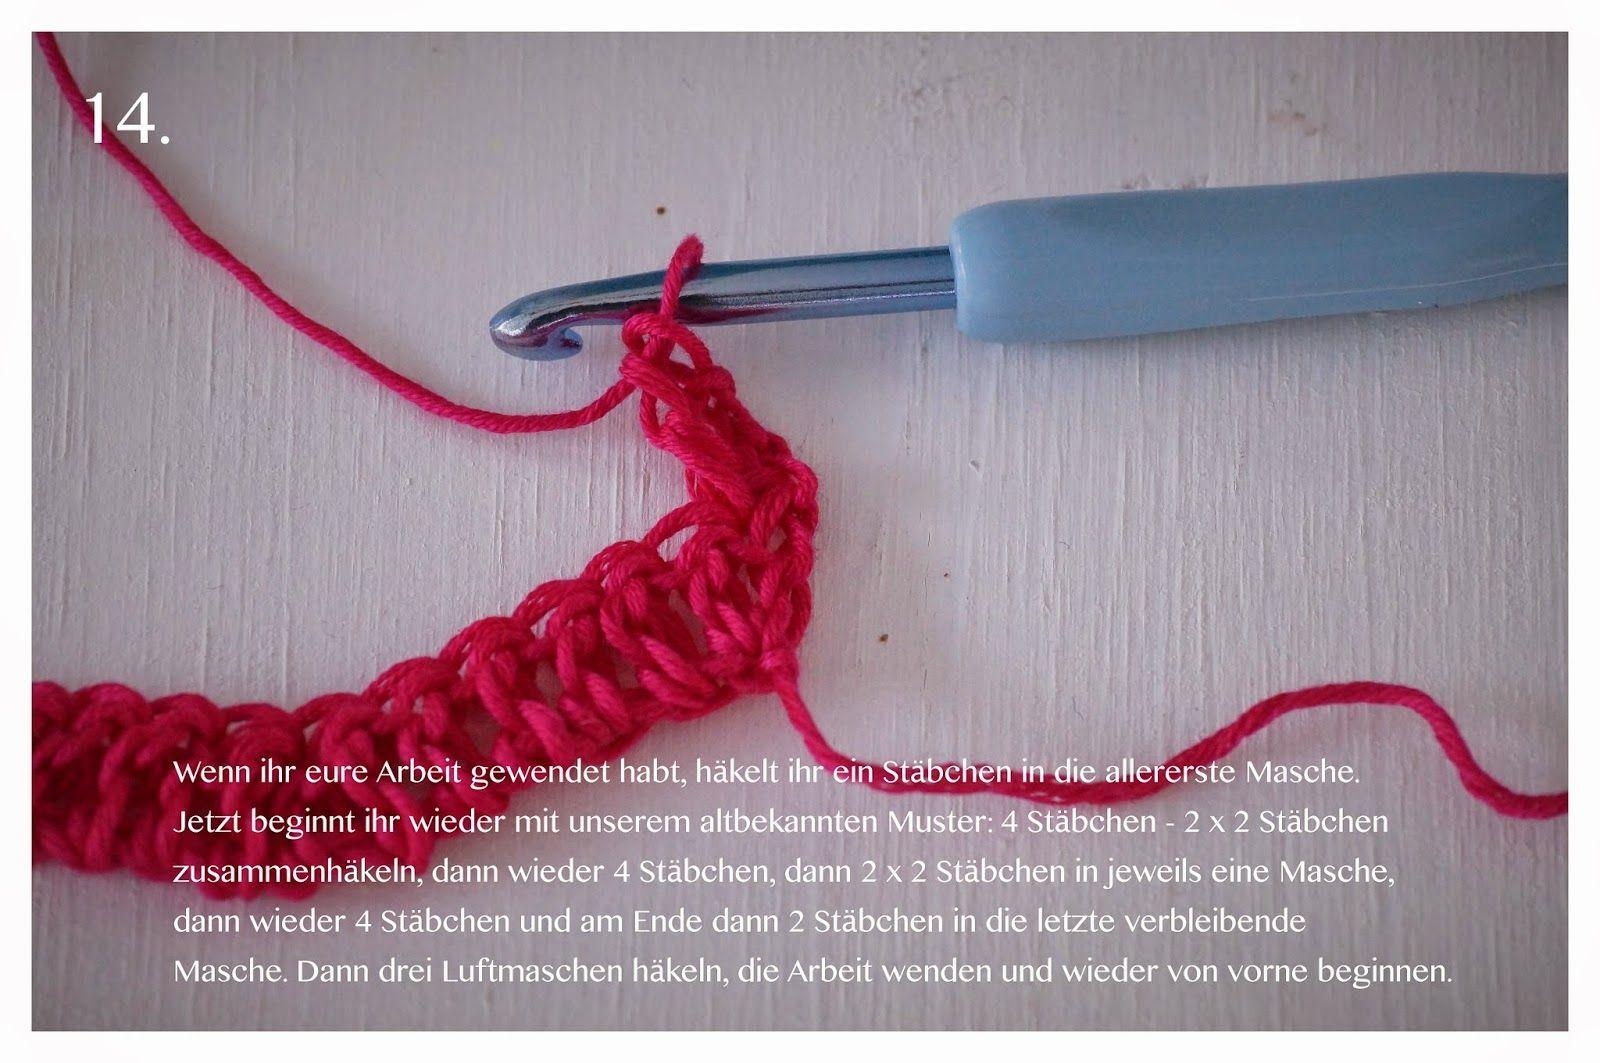 Crochet Ripple Blanket, Häkeldecke mit Wellenmuster, Anleitung ...